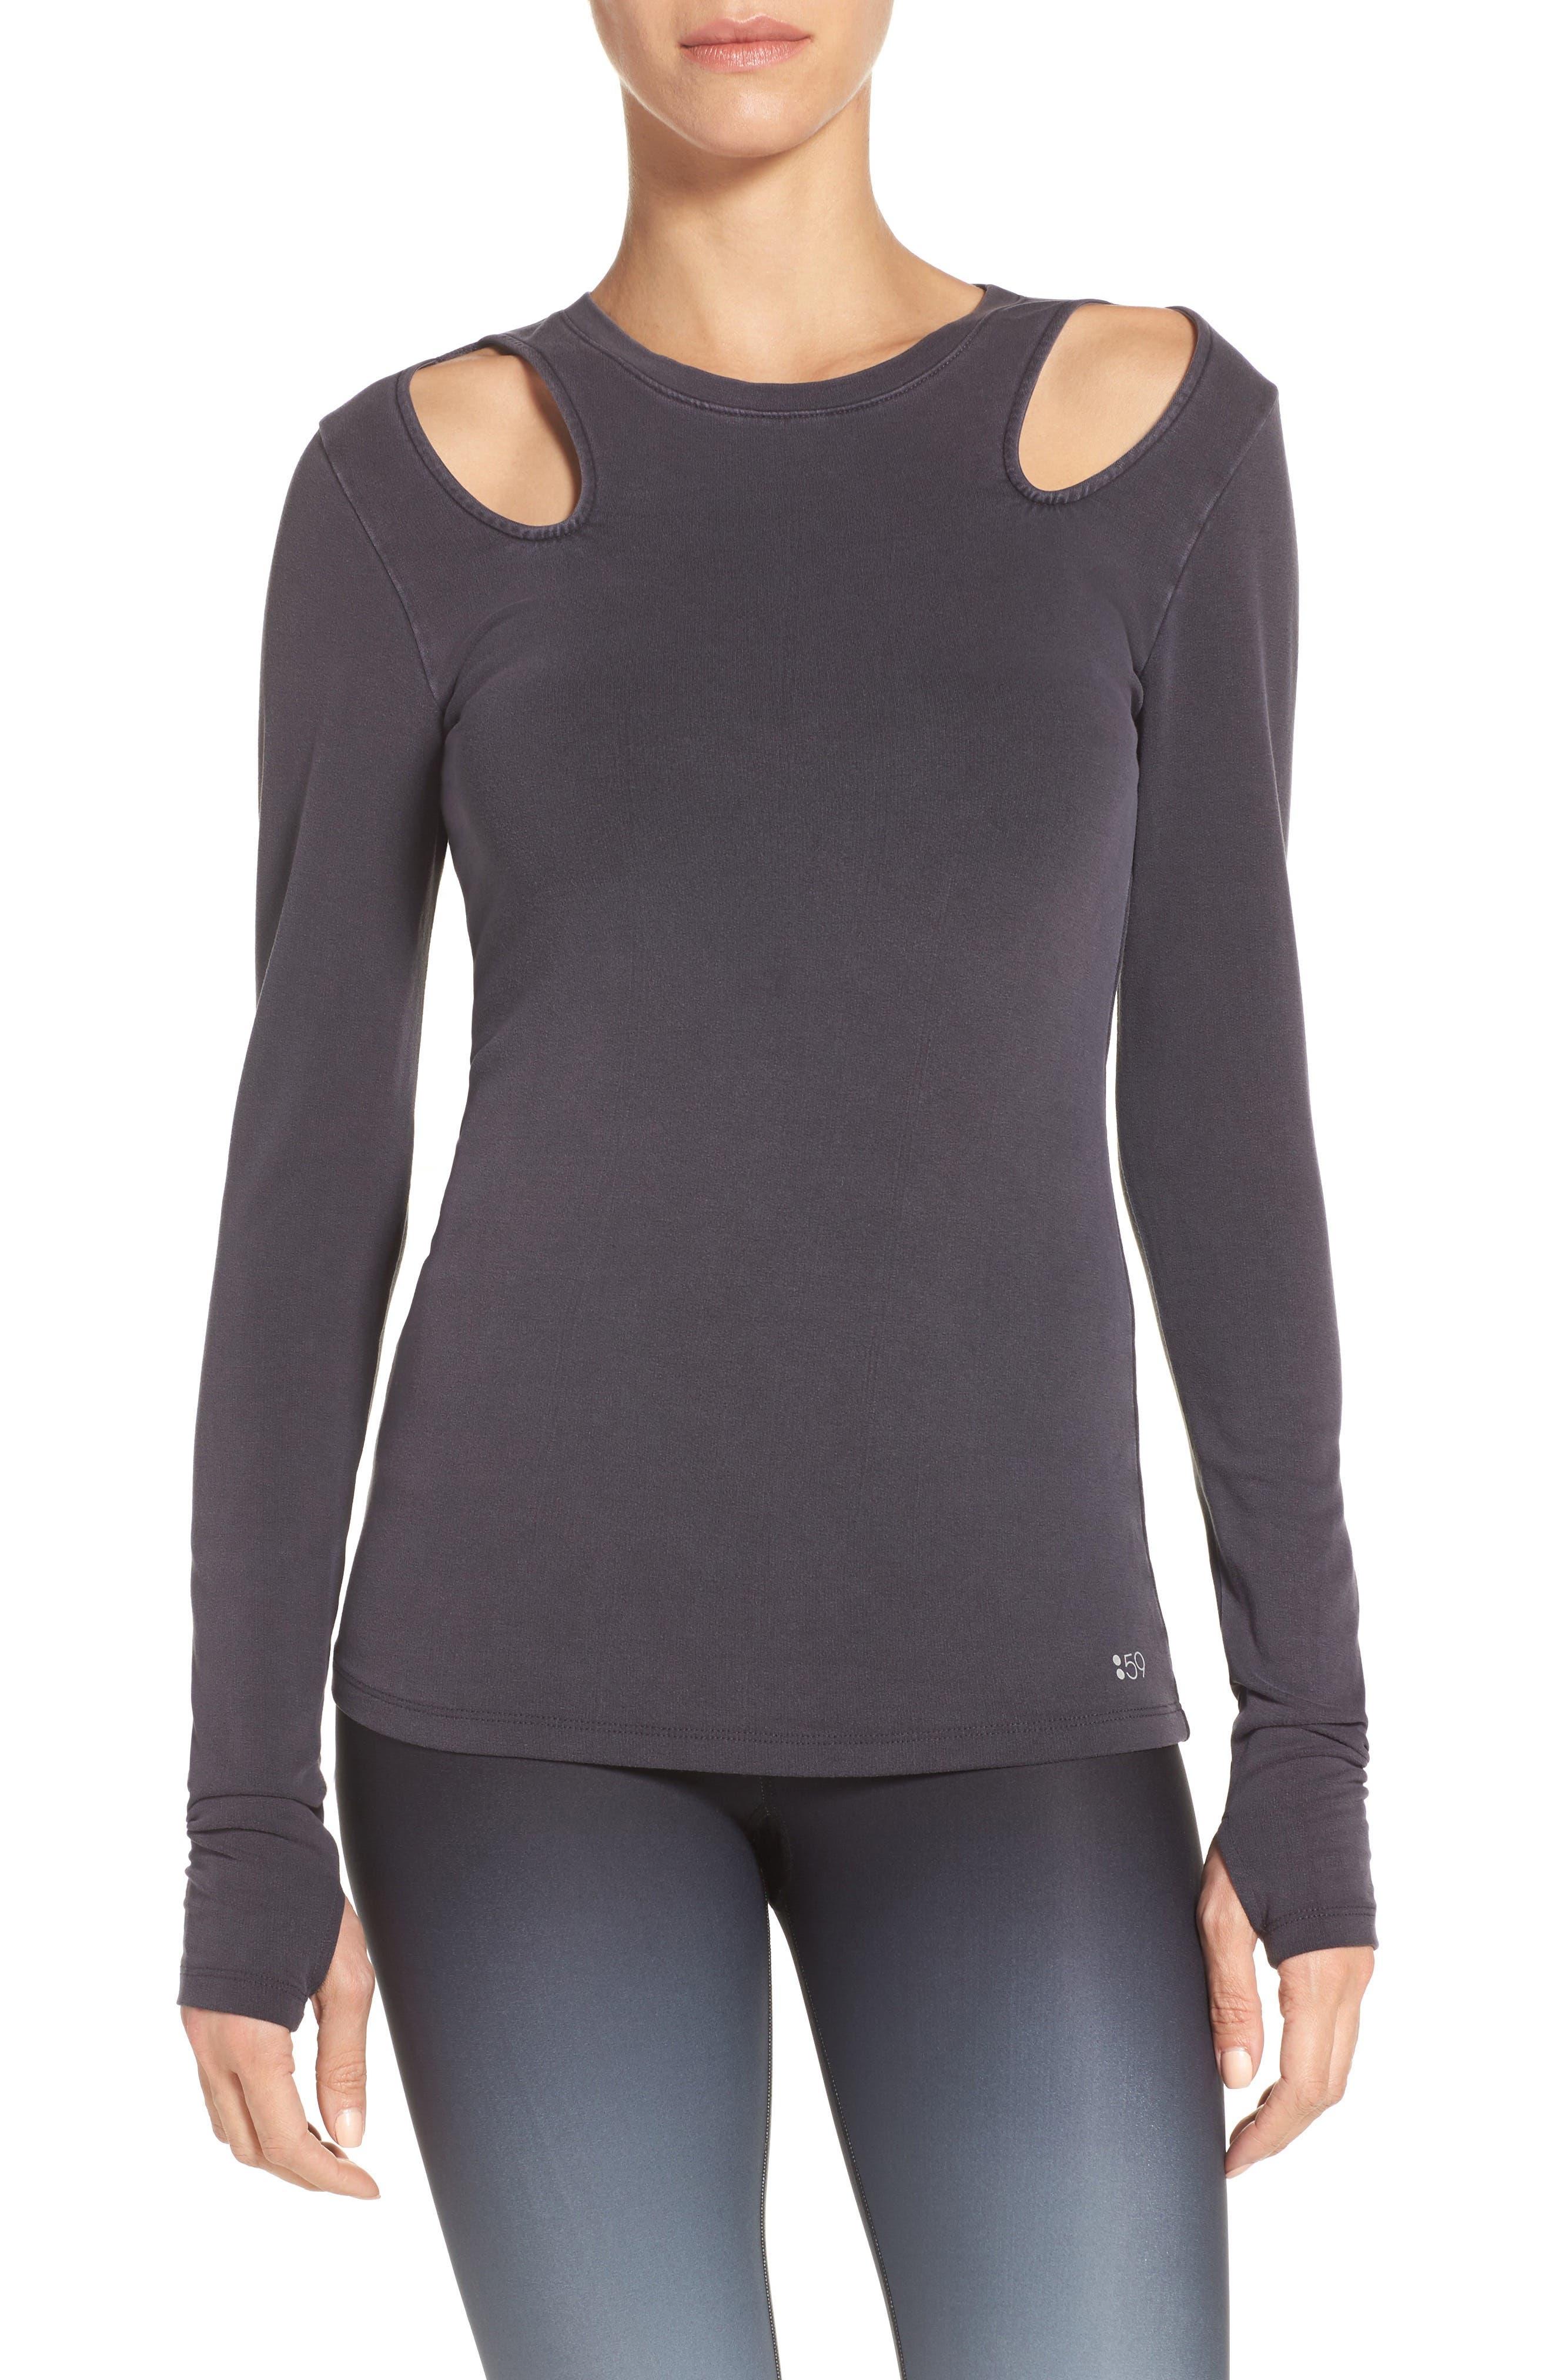 Splits59 Alexis Cutout Sweatshirt